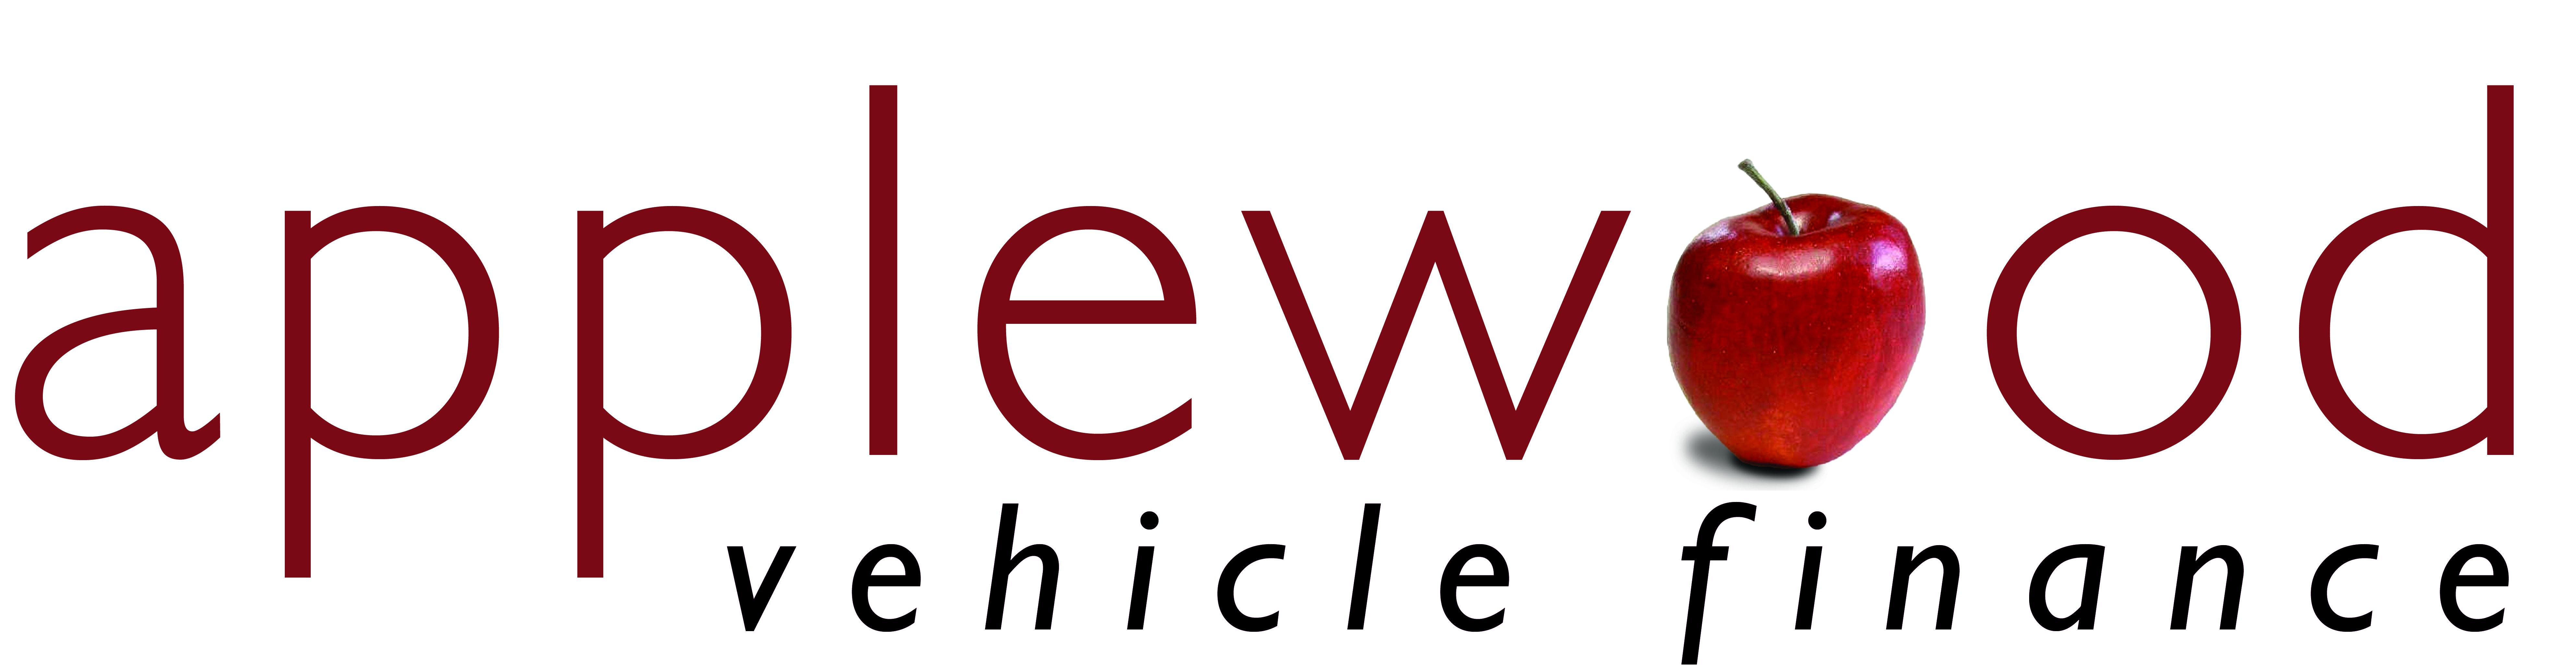 Applewood Vehicle Finance